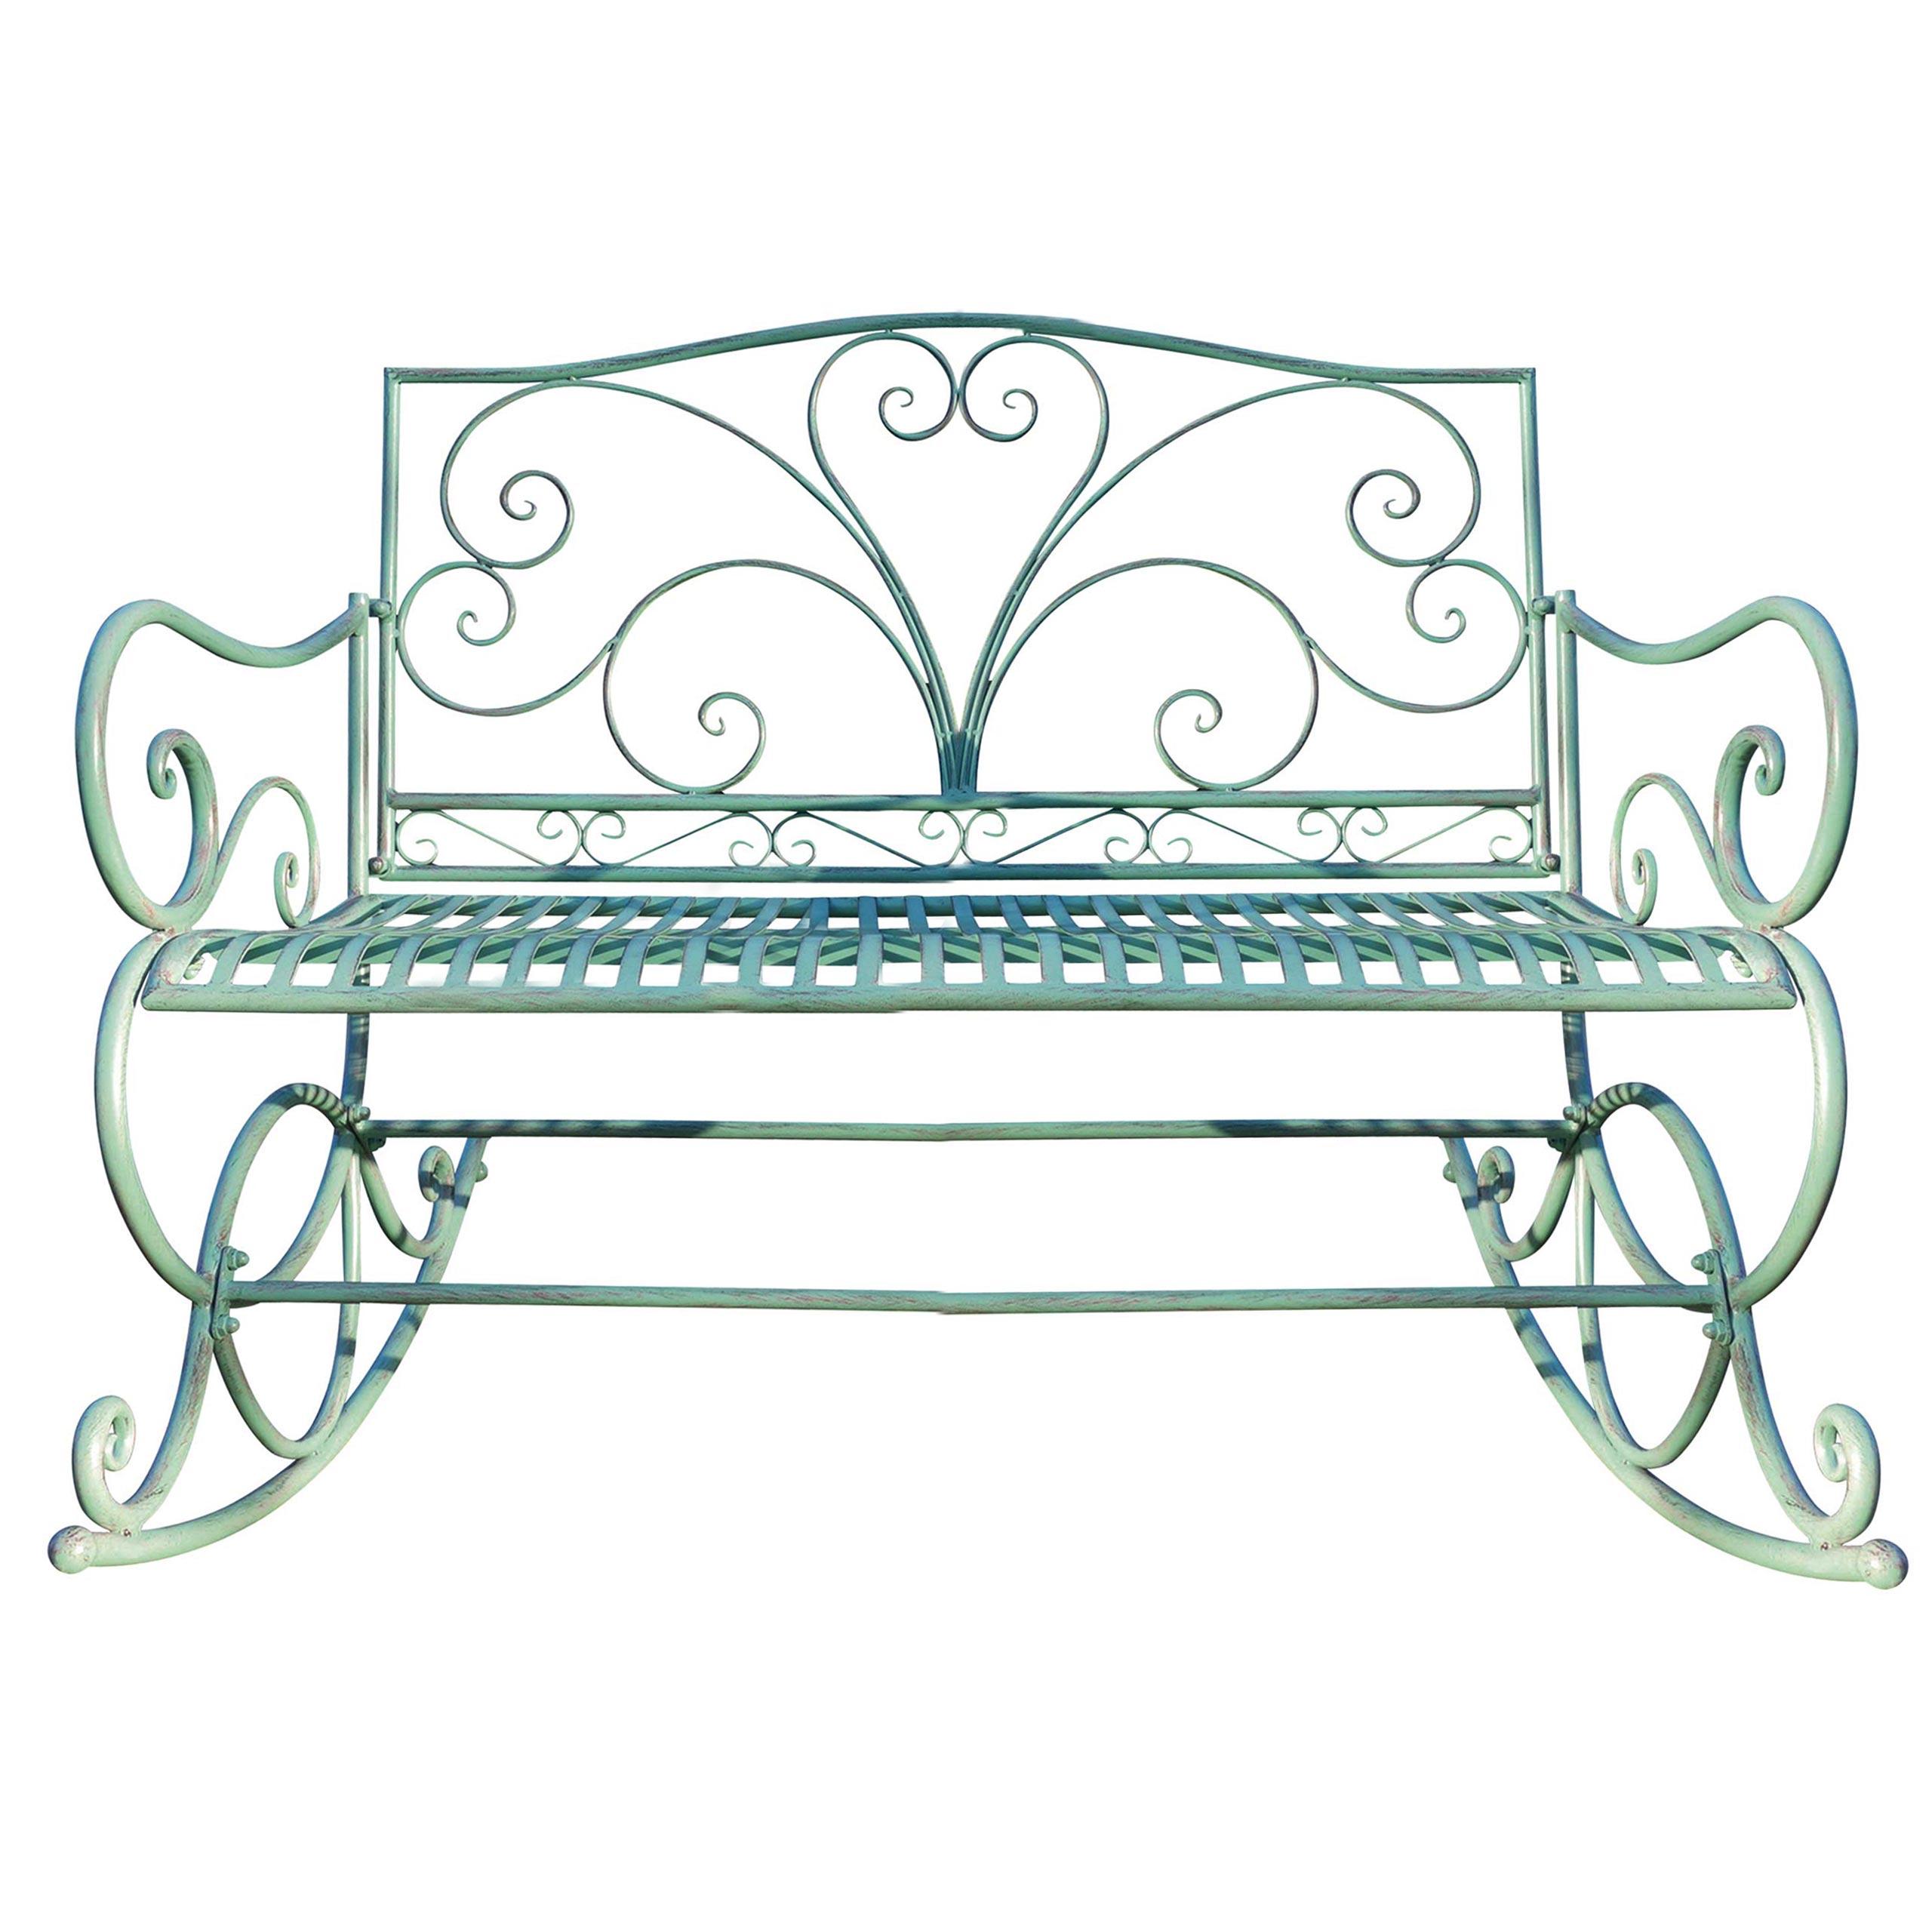 Panchina a dondolo HWC-C39 stile romantico metallo 112cm verde antico